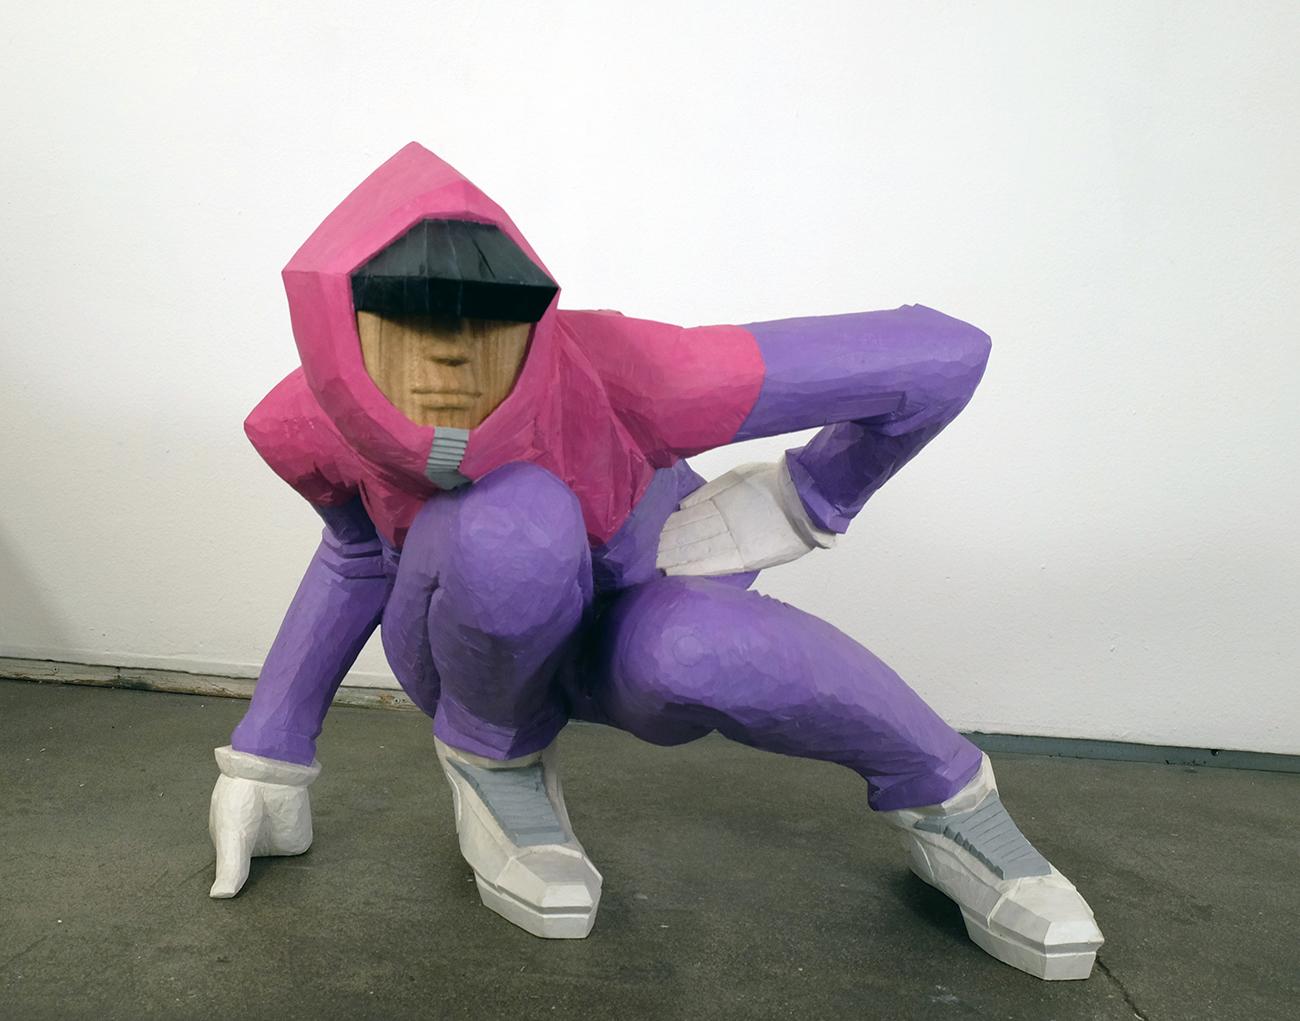 taku obata radar 2 - BUST A MOVE : Taku Obata célèbre le breakdance en sculptant des danseurs en plein mouvement